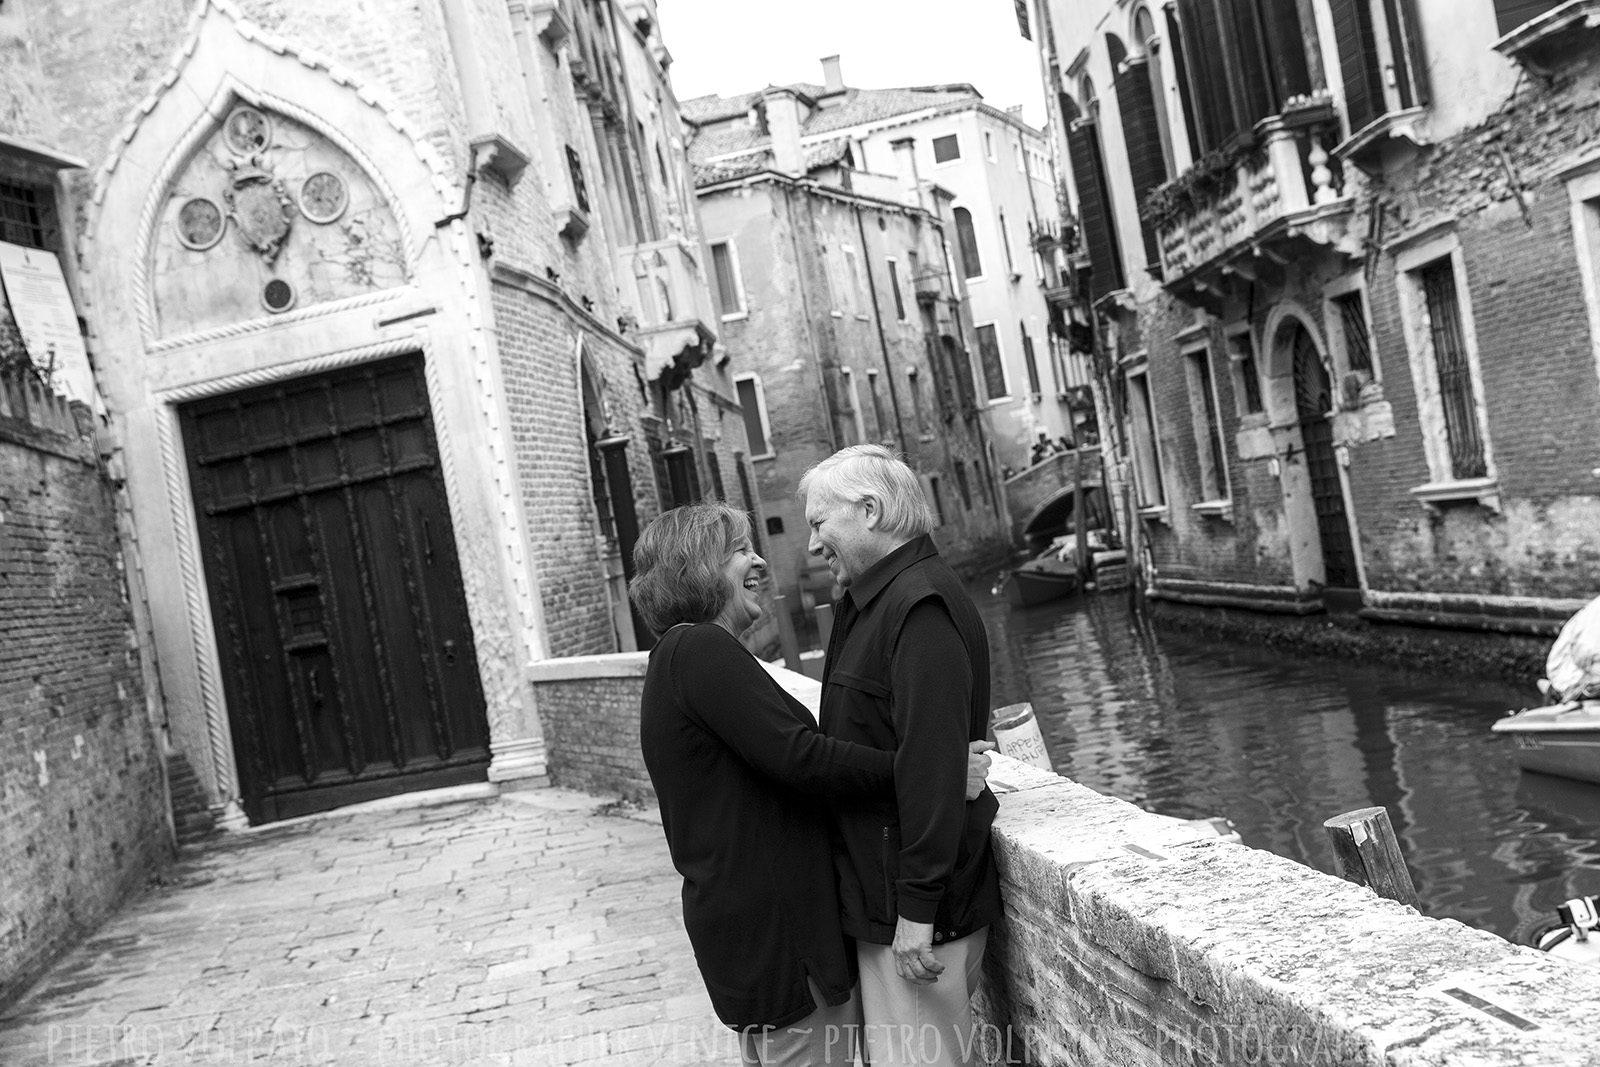 photographer-venice-italy-couple-vacation-photo-shoot-tour-20170321_01